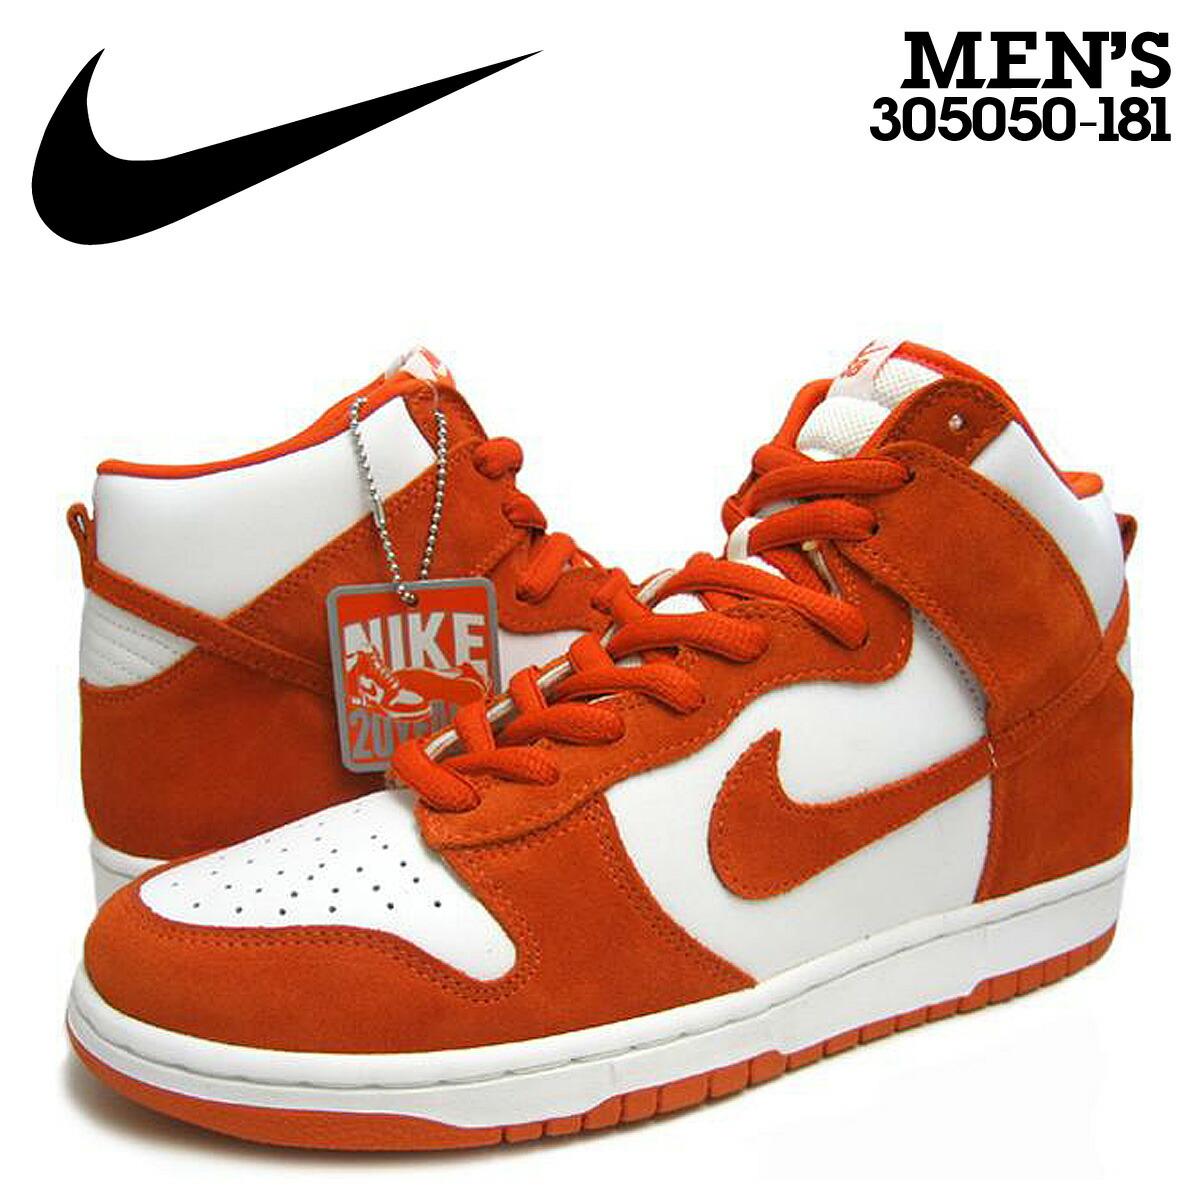 70936dc0a0b4 Whats up Sports  NIKE Nike Dunk dunk Hi Pro SB 20th anniversary ...